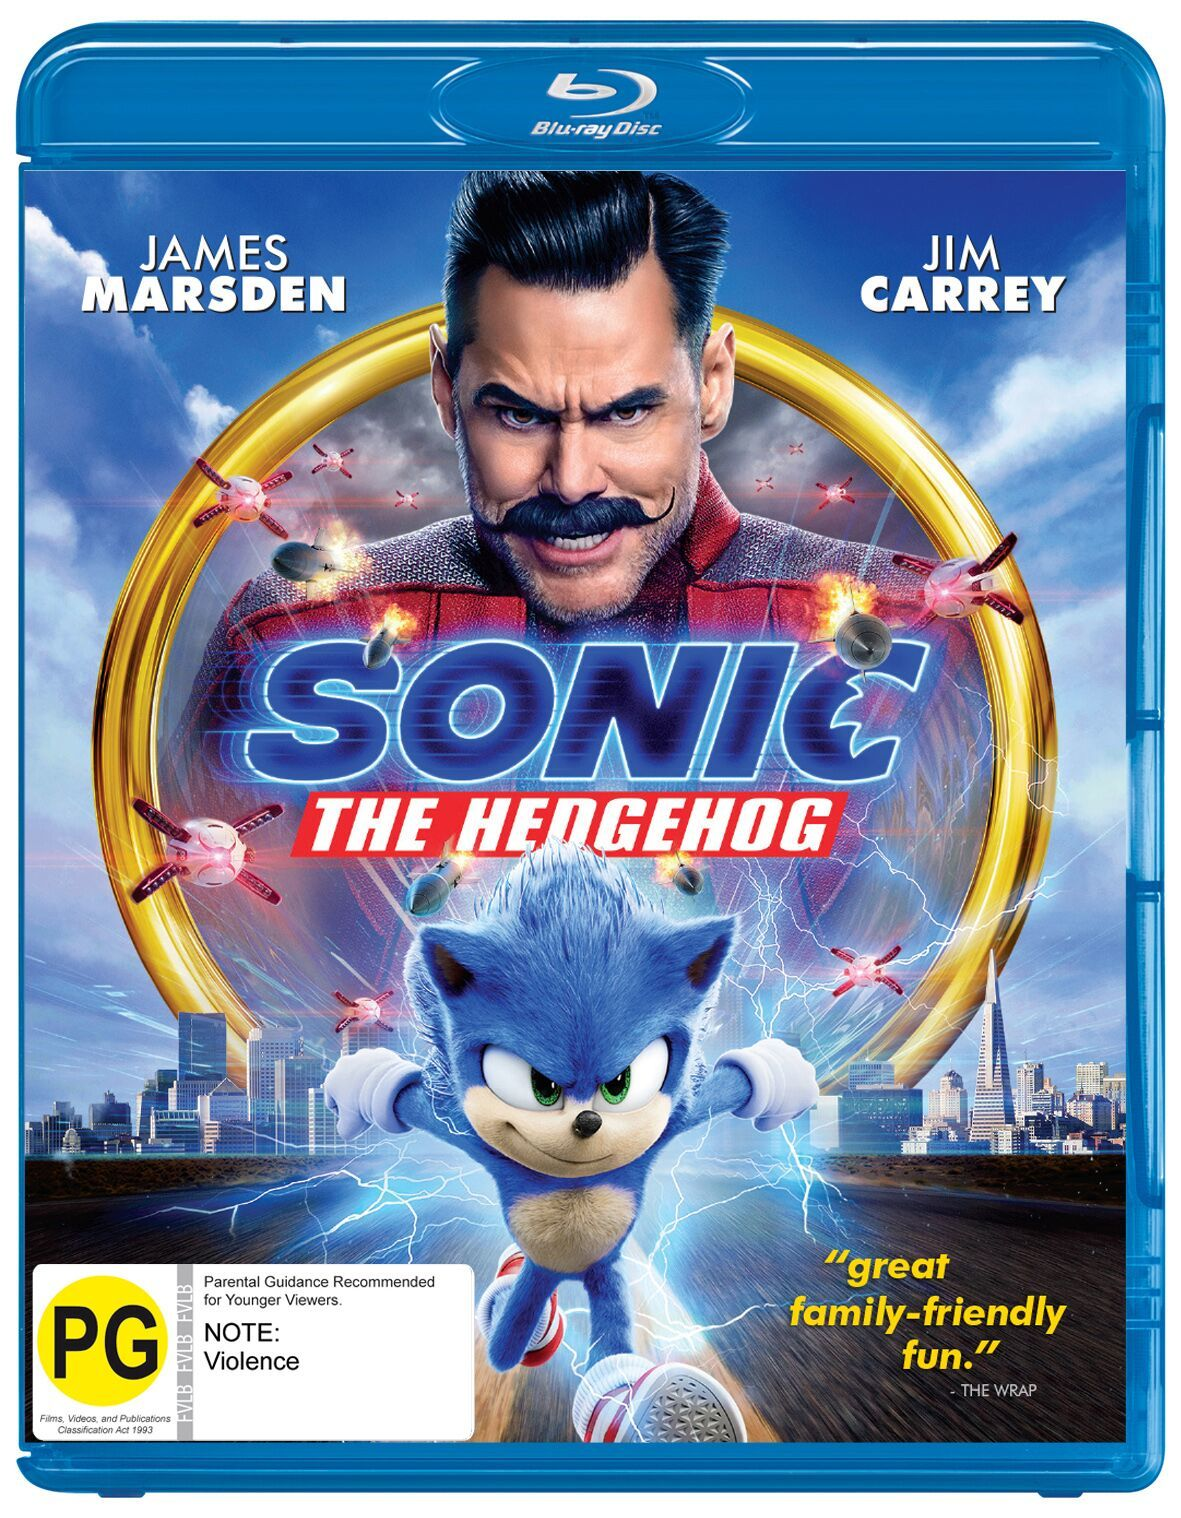 Sonic The Hedgehog on Blu-ray image